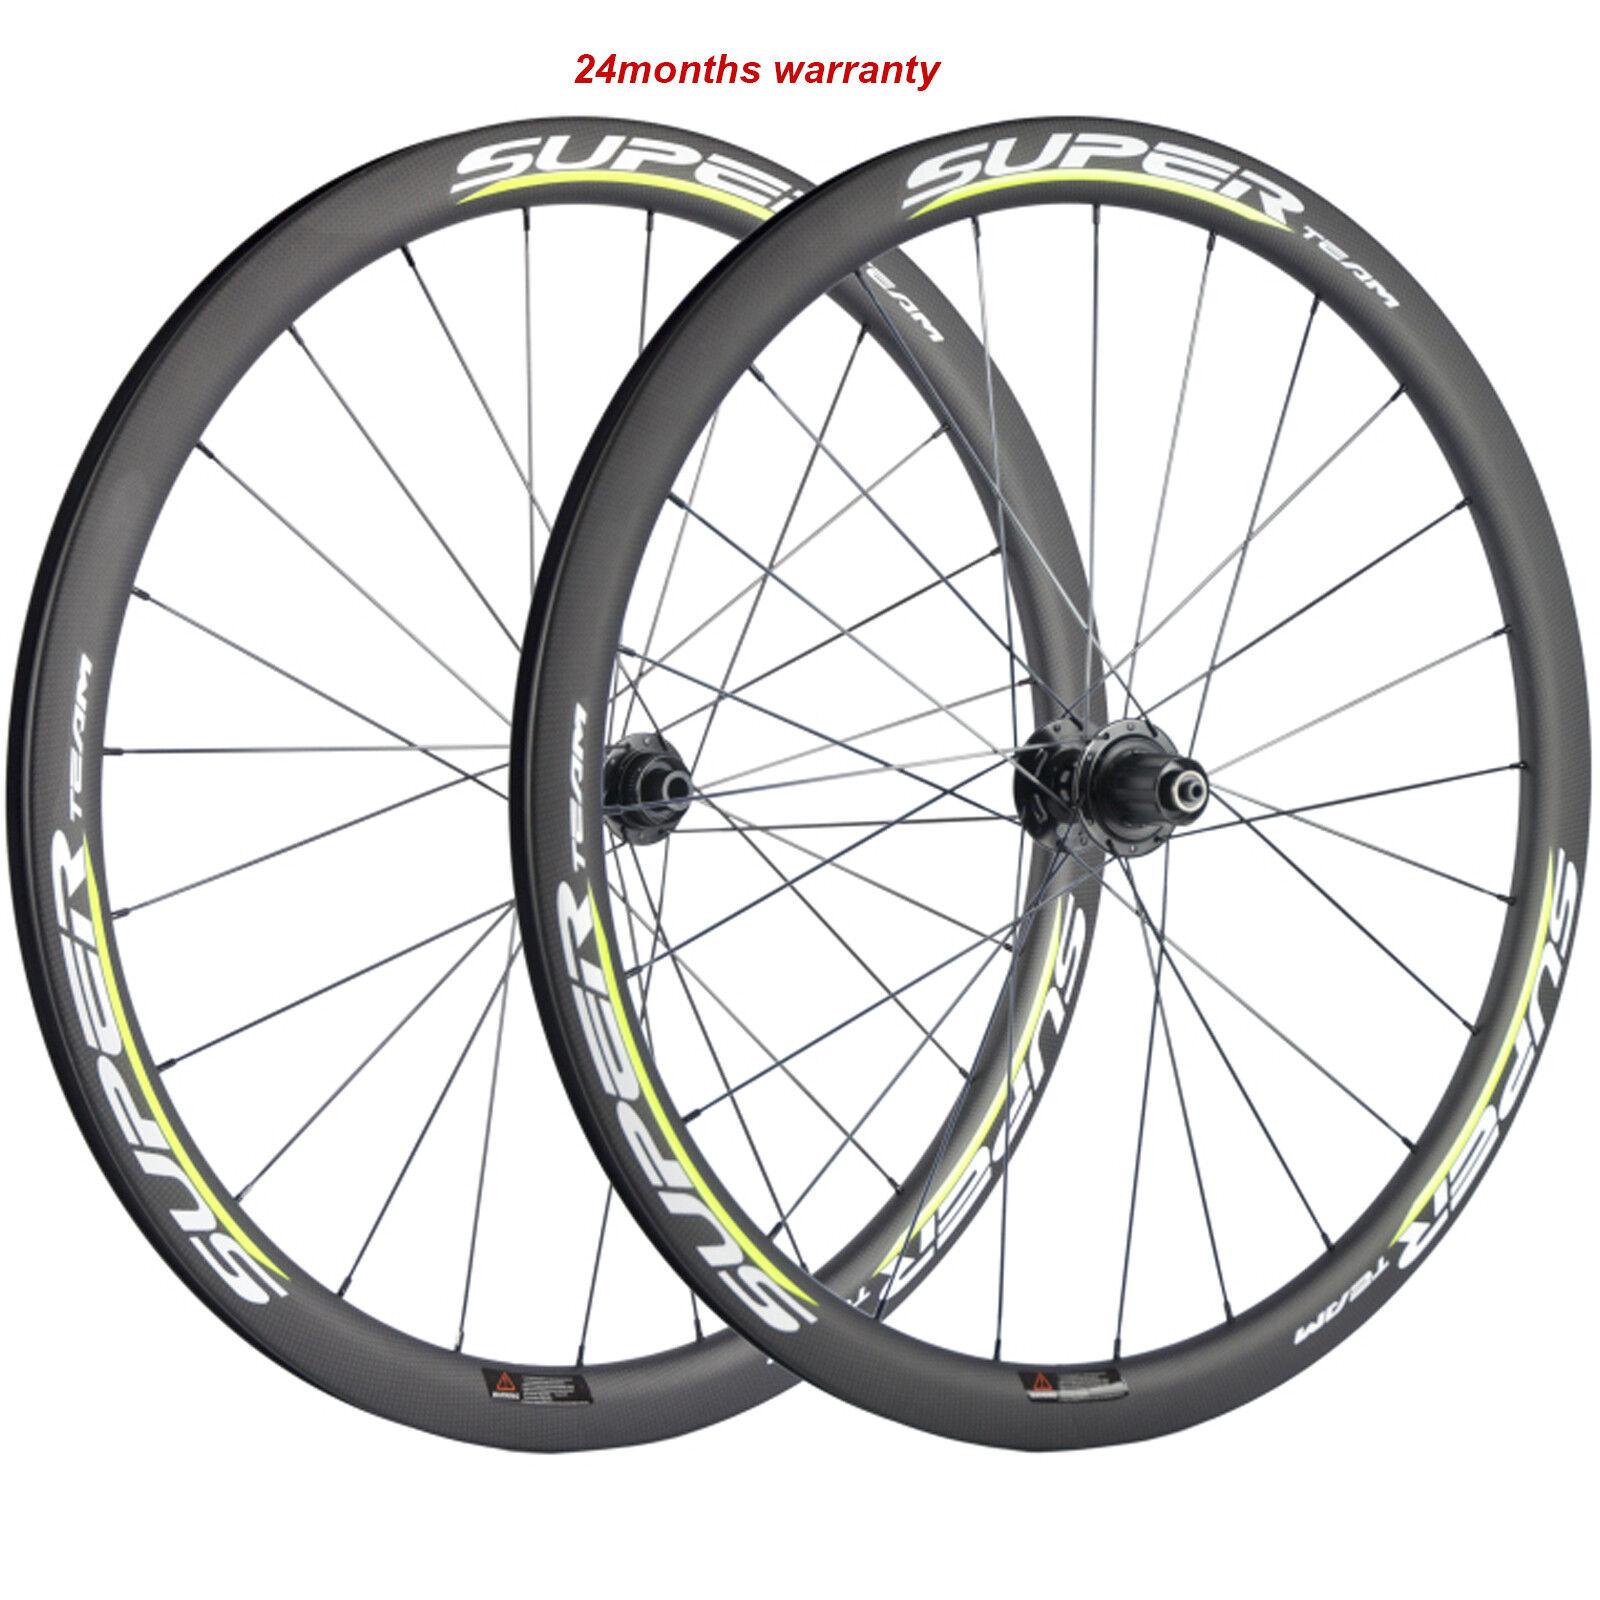 Superteam 40mm Carbon Wheelset Road Bike  Disc Brake Wheels CX3 Dics Road Hub  presenting all the latest high street fashion